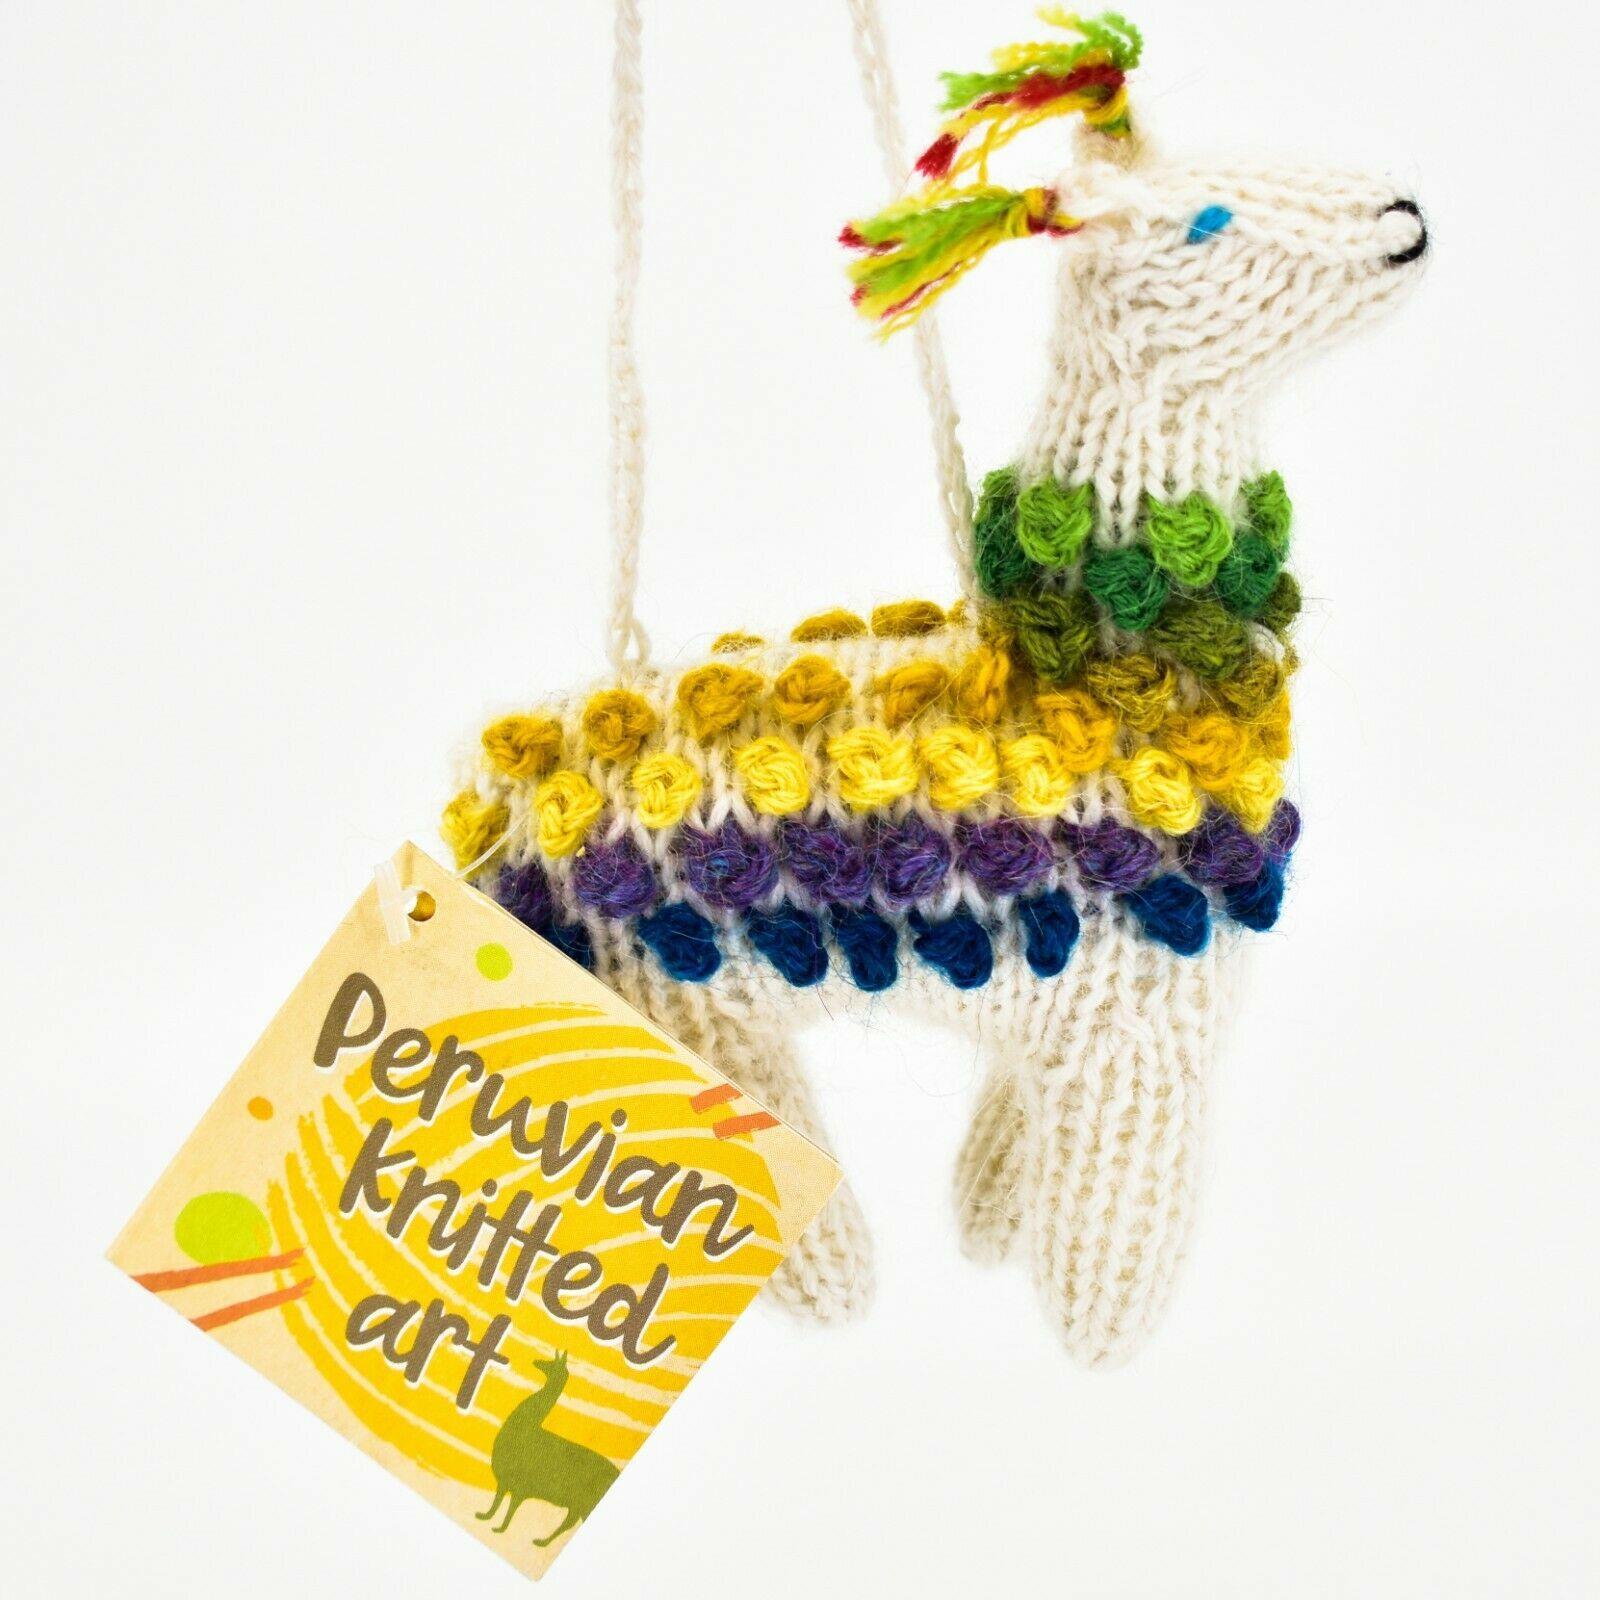 Handknit Alpaca Wool Whimsical Hanging Llama Ornament Handmade in Peru